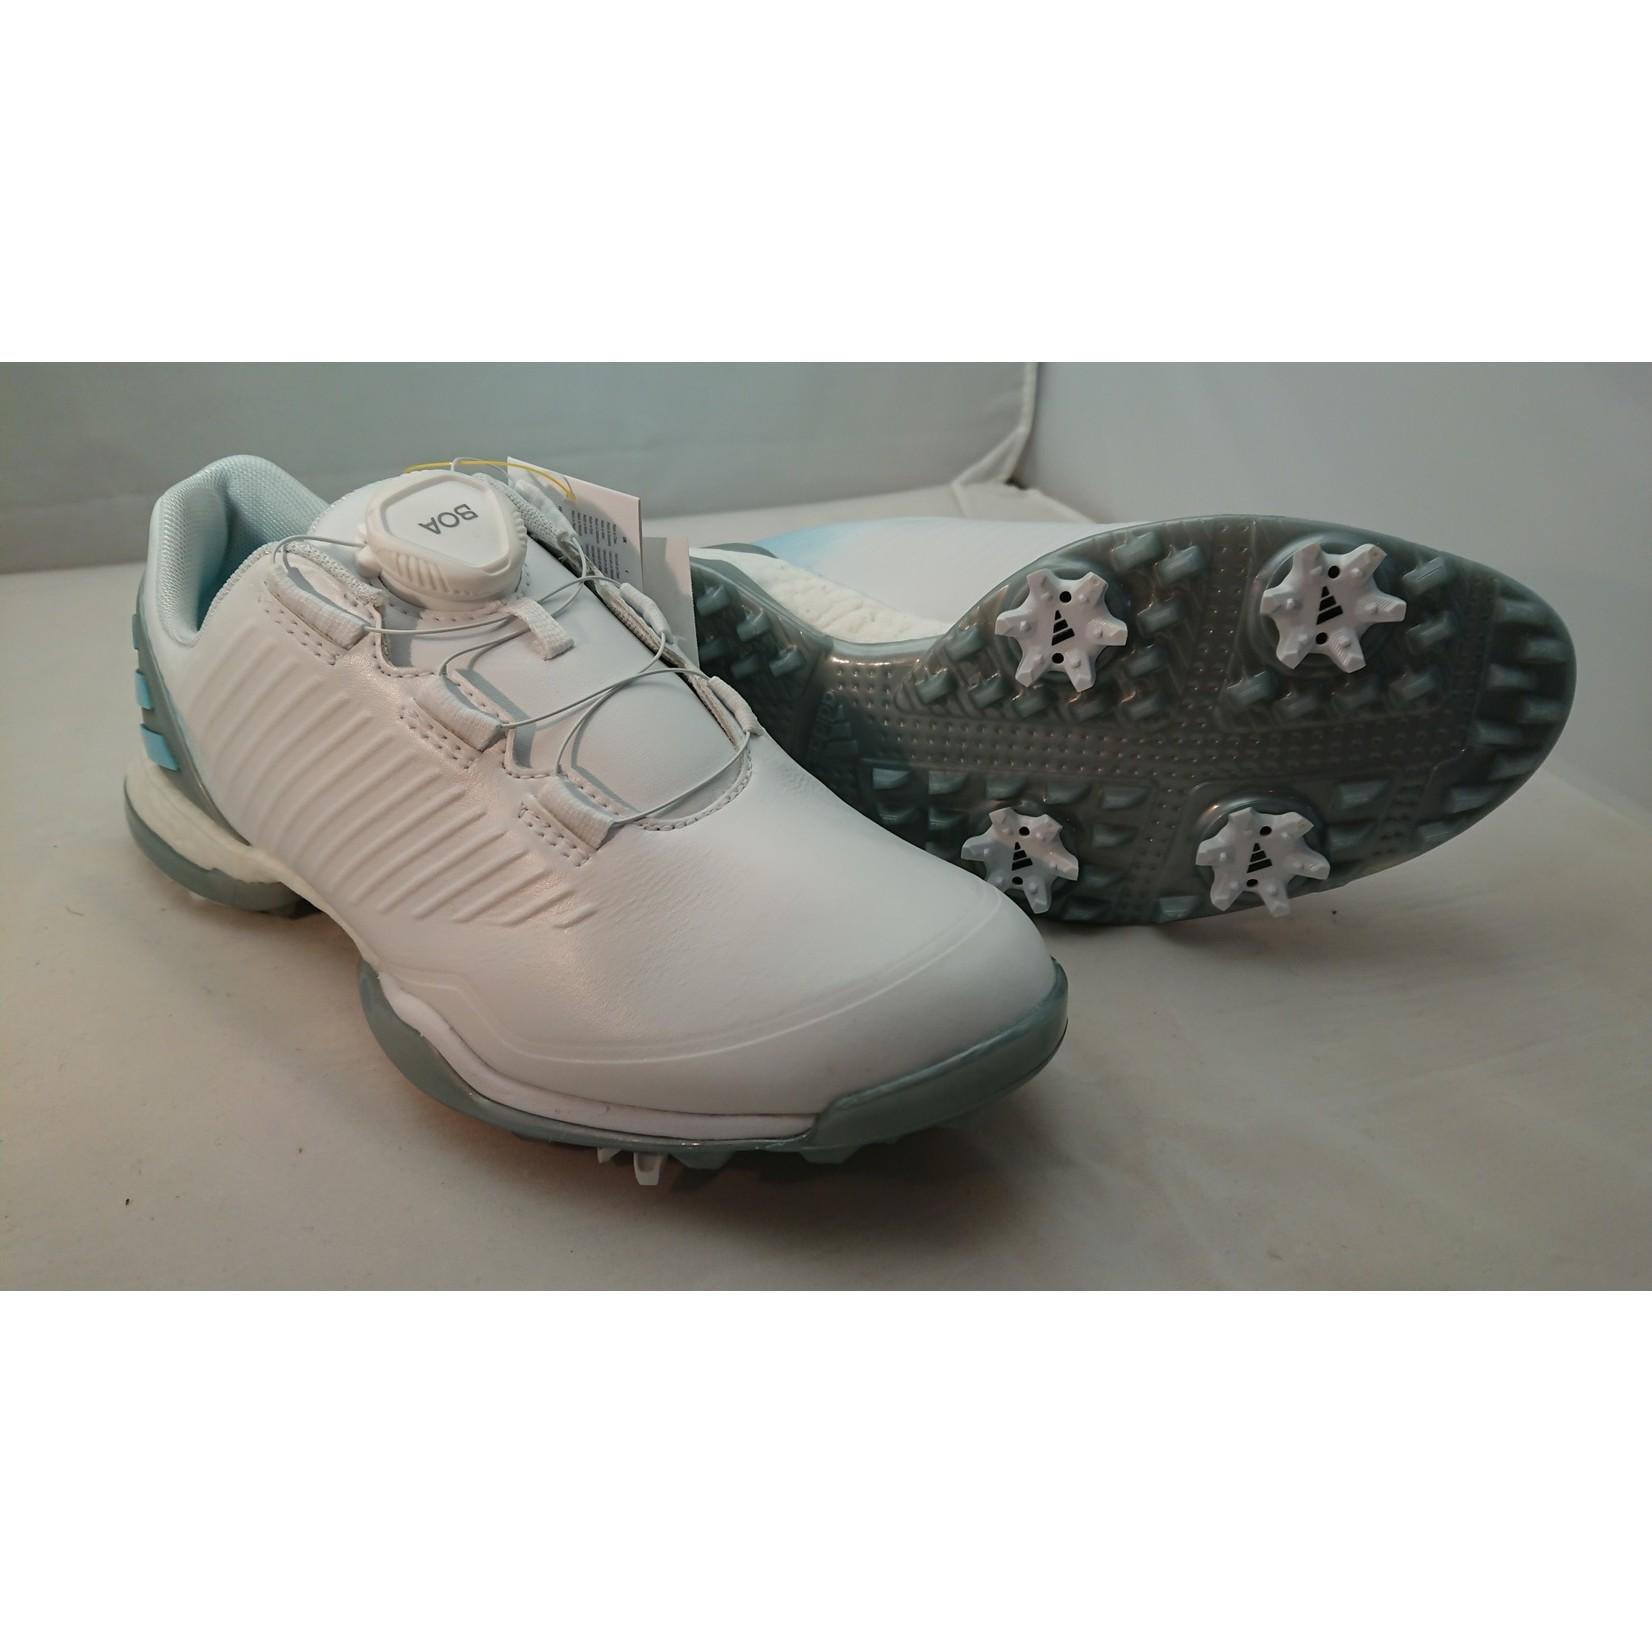 Adidas Adidas W Adipower 4GED Boa Wit 36 2/3